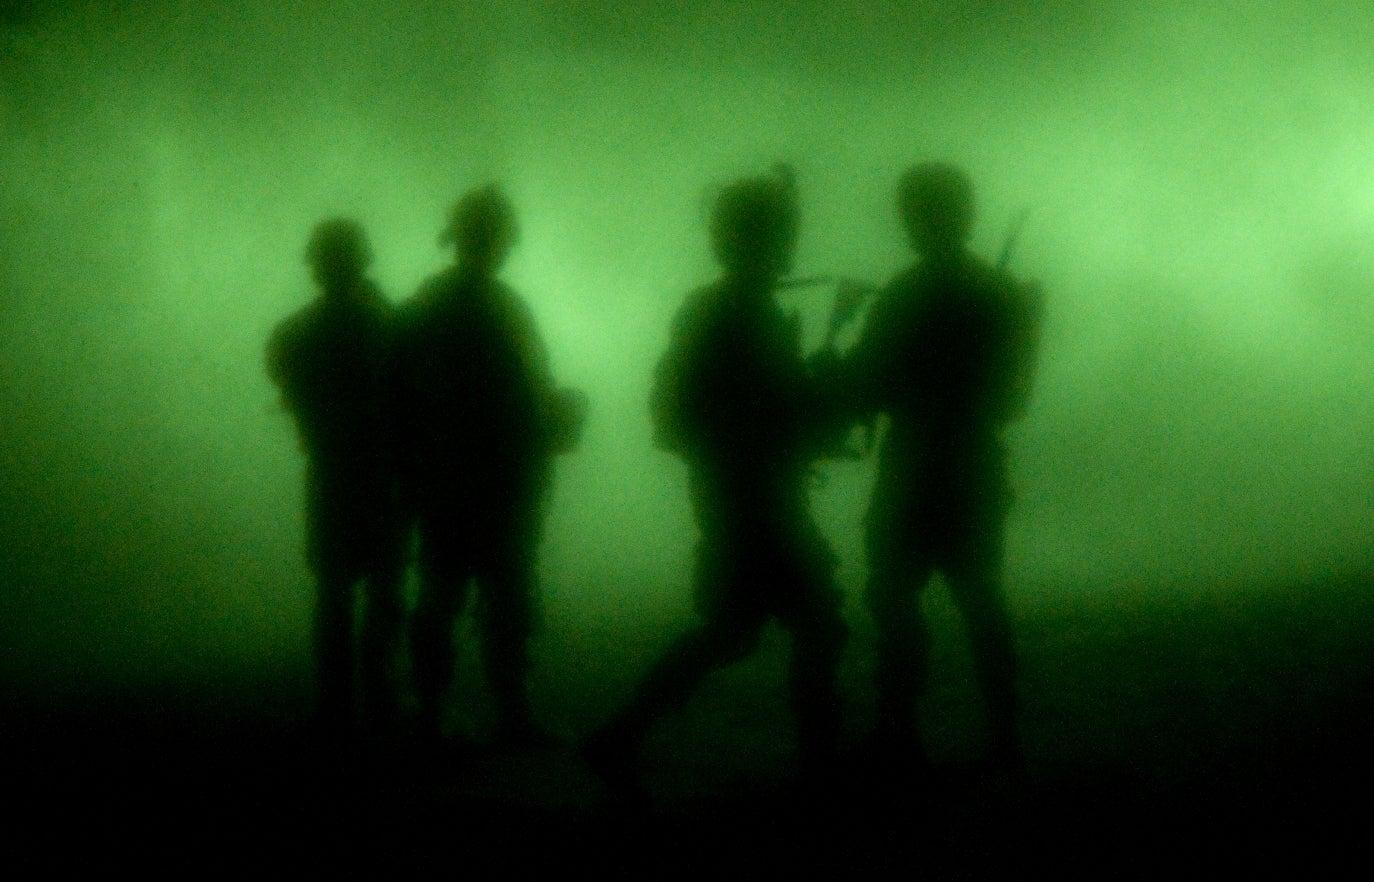 Some troops will be stuck in Afghanistan beyond their departure dates due to coronavirus screening